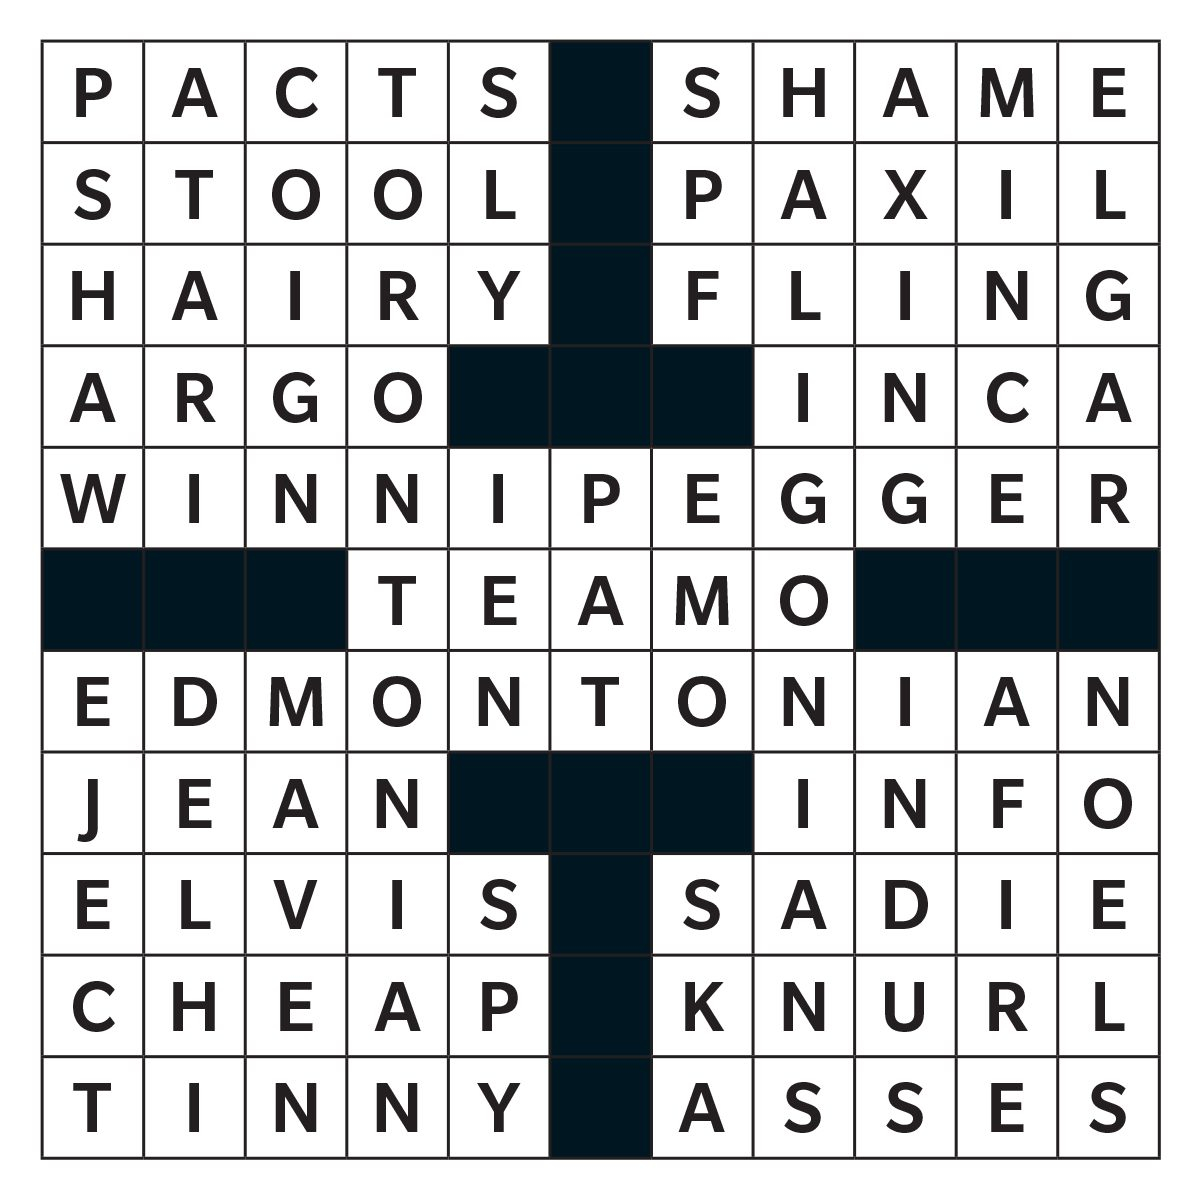 Reader's Digest Printable Crossword Puzzles